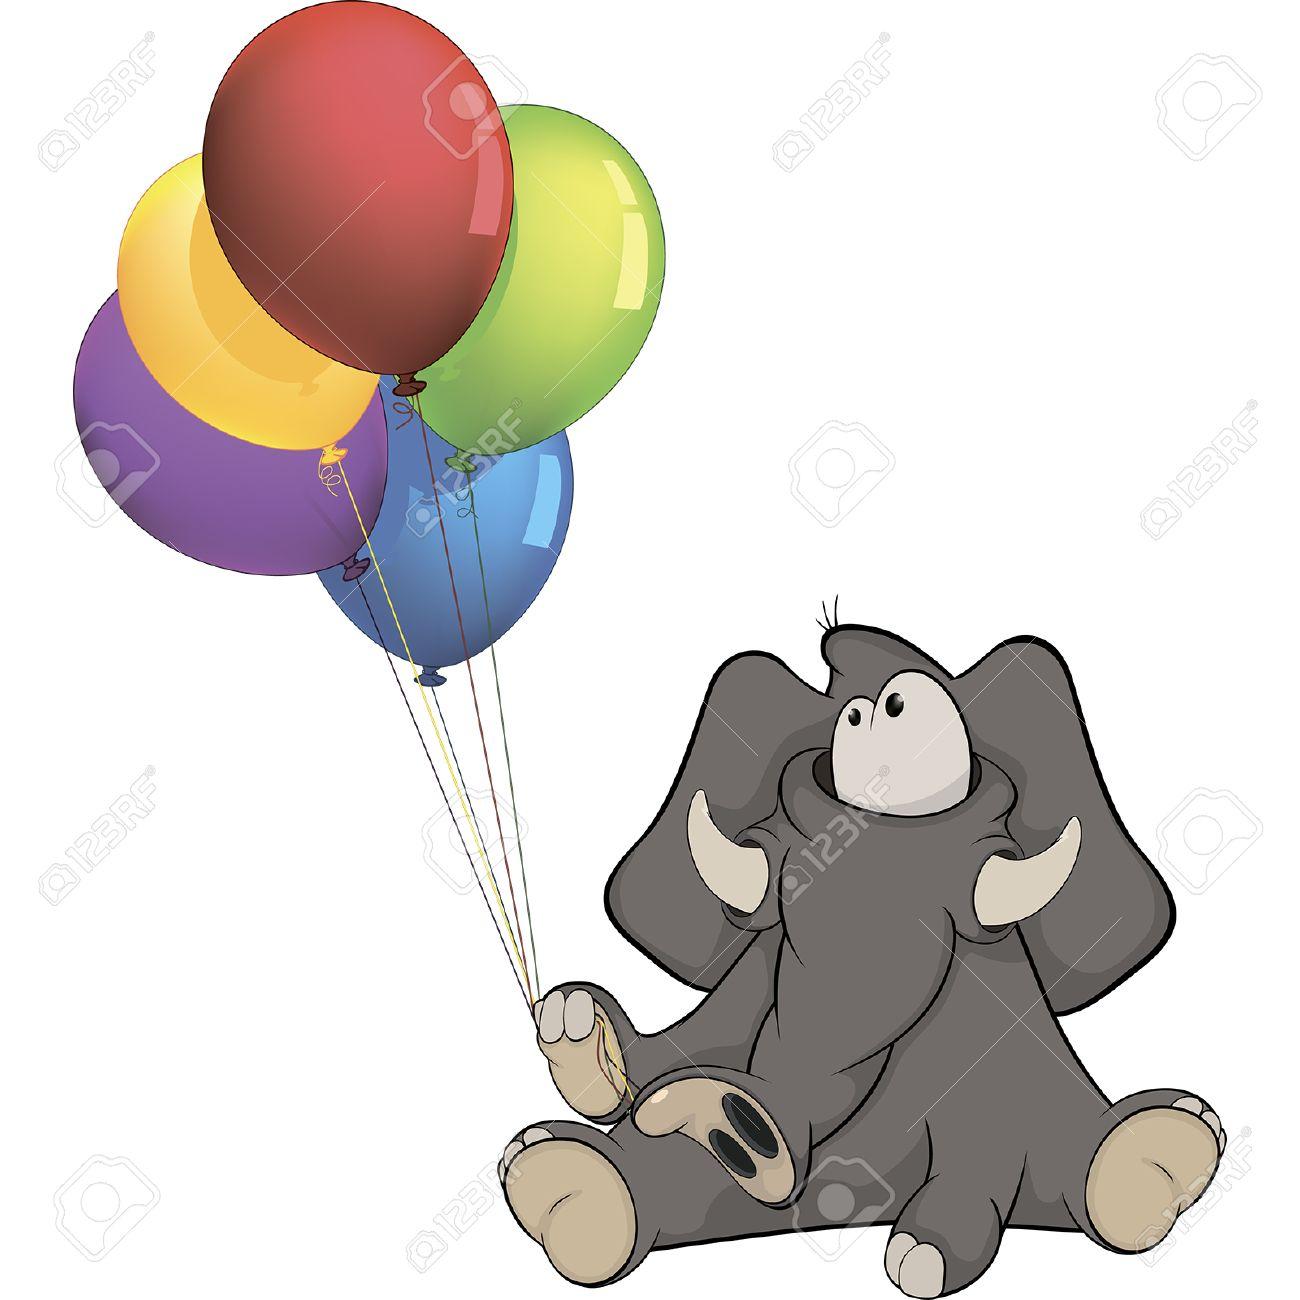 The Elephant Calf And Birthday Balloons Cartoon Stock Vector